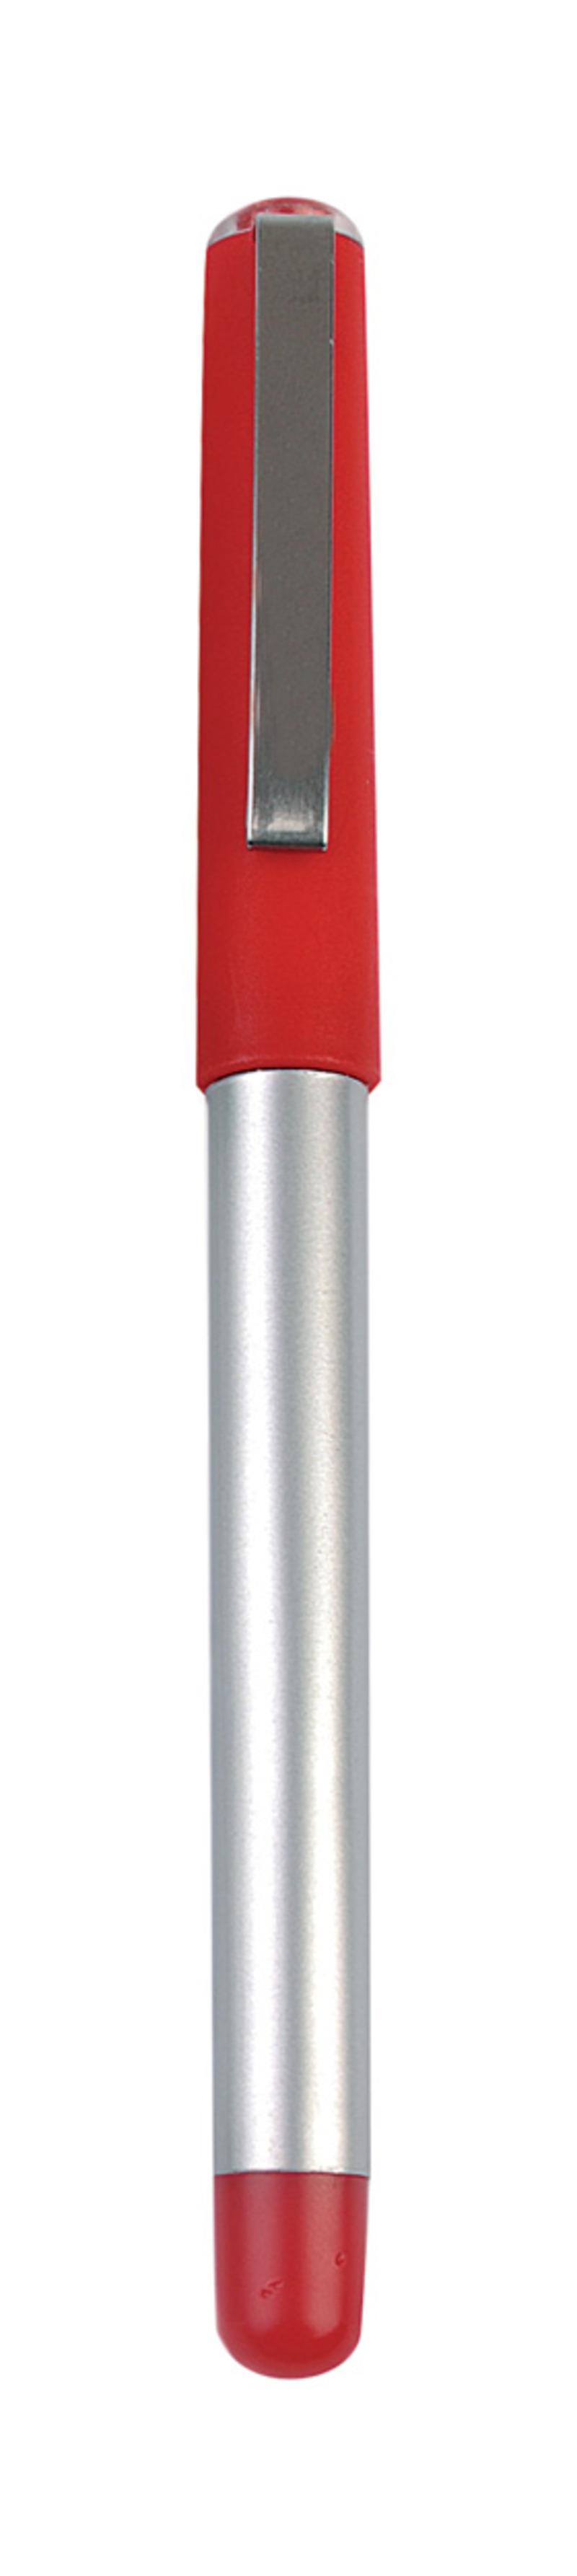 Estrim roller pen